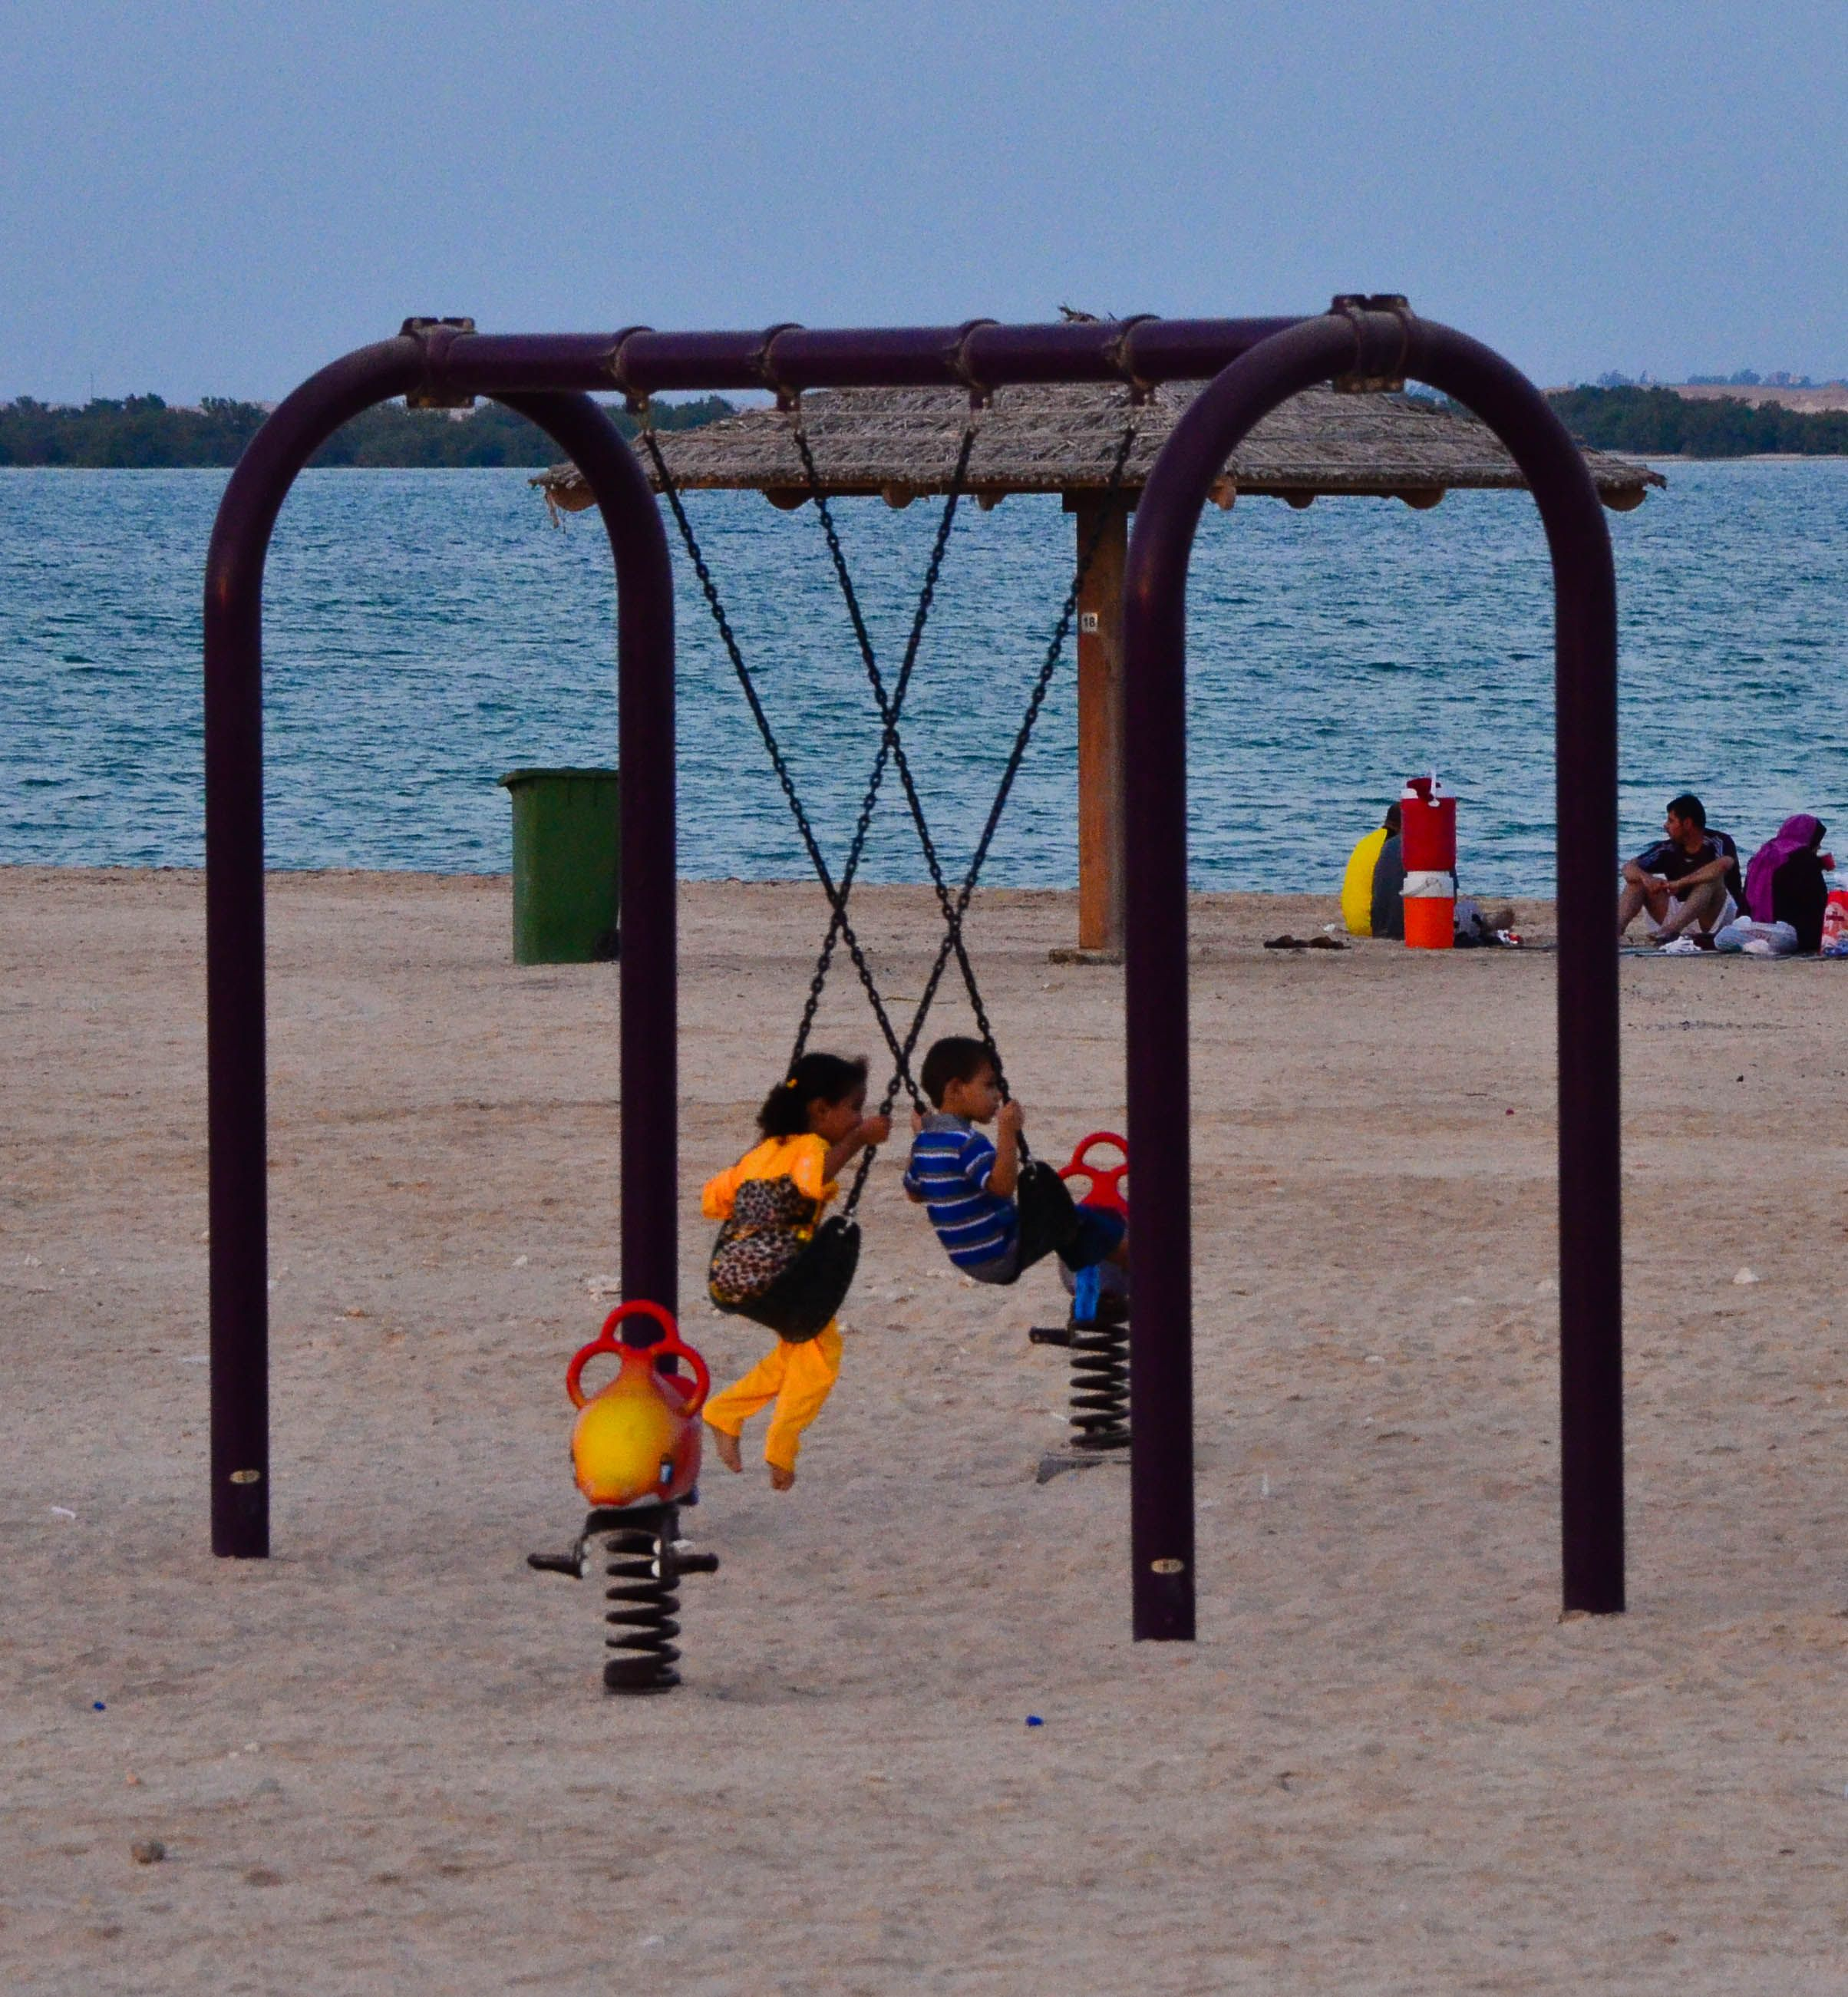 In fakreh coast, qatar.. Kids at play